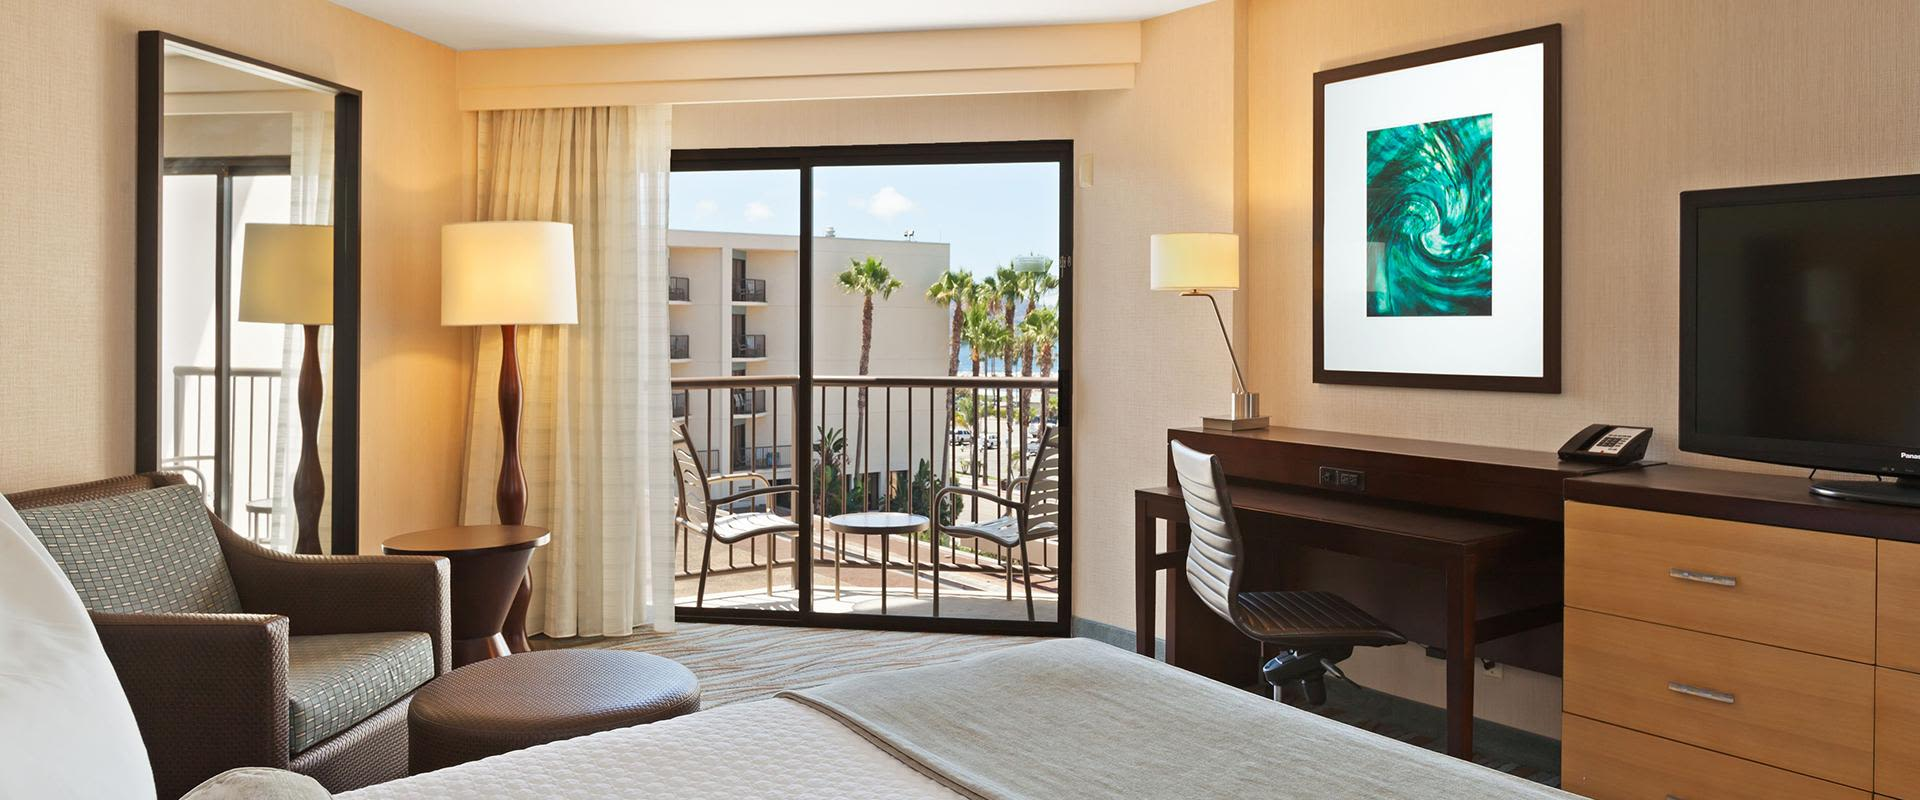 Redondo Beach Room With Ocean View